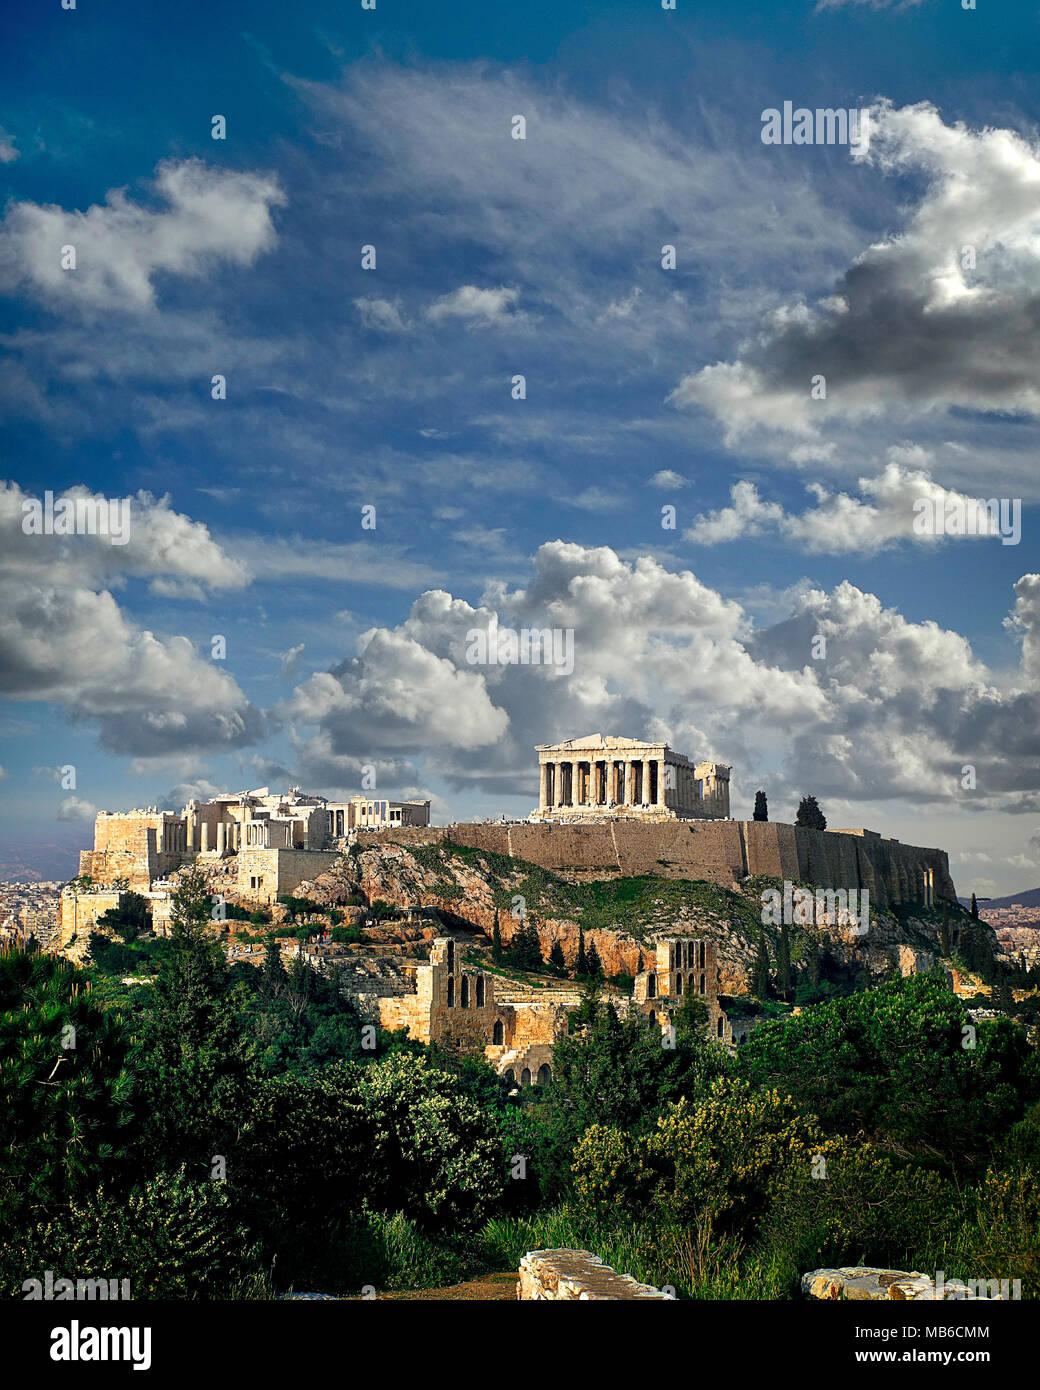 GR - ATHENS: The Acropolis - Stock Image